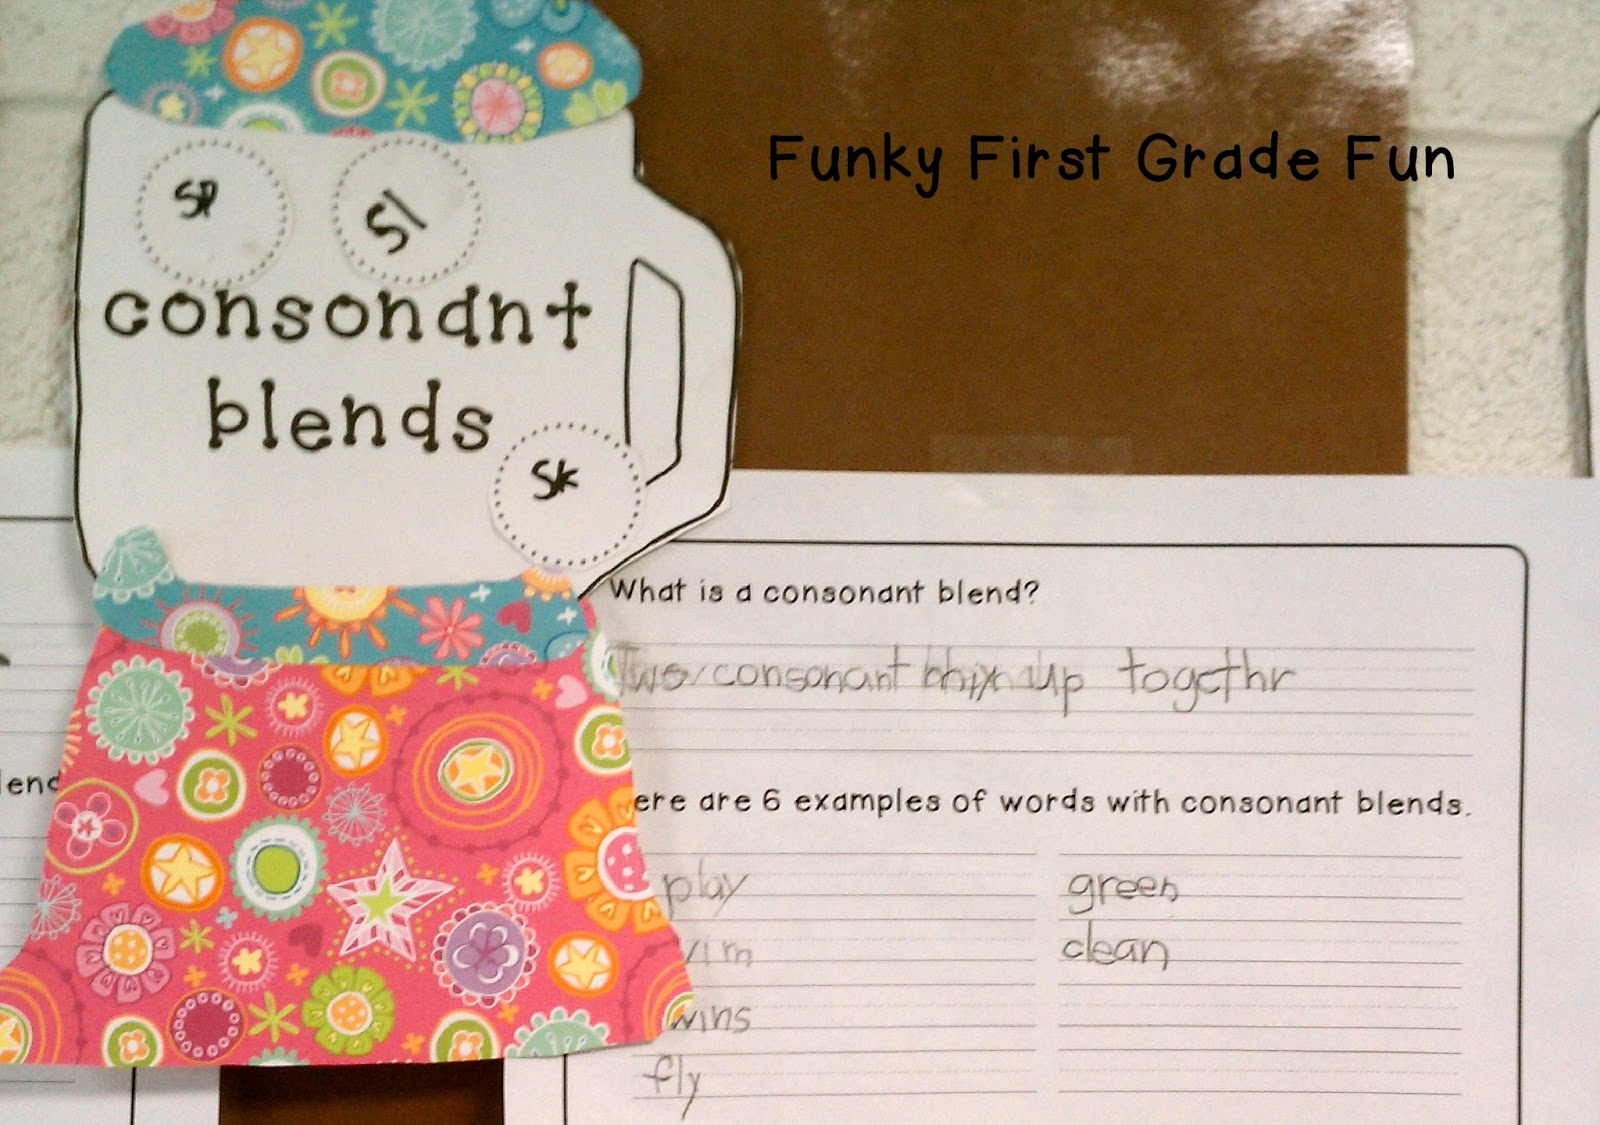 Worksheet Definition Of Consonant Blend funky first grade fun put em in the blender consonant blends blends